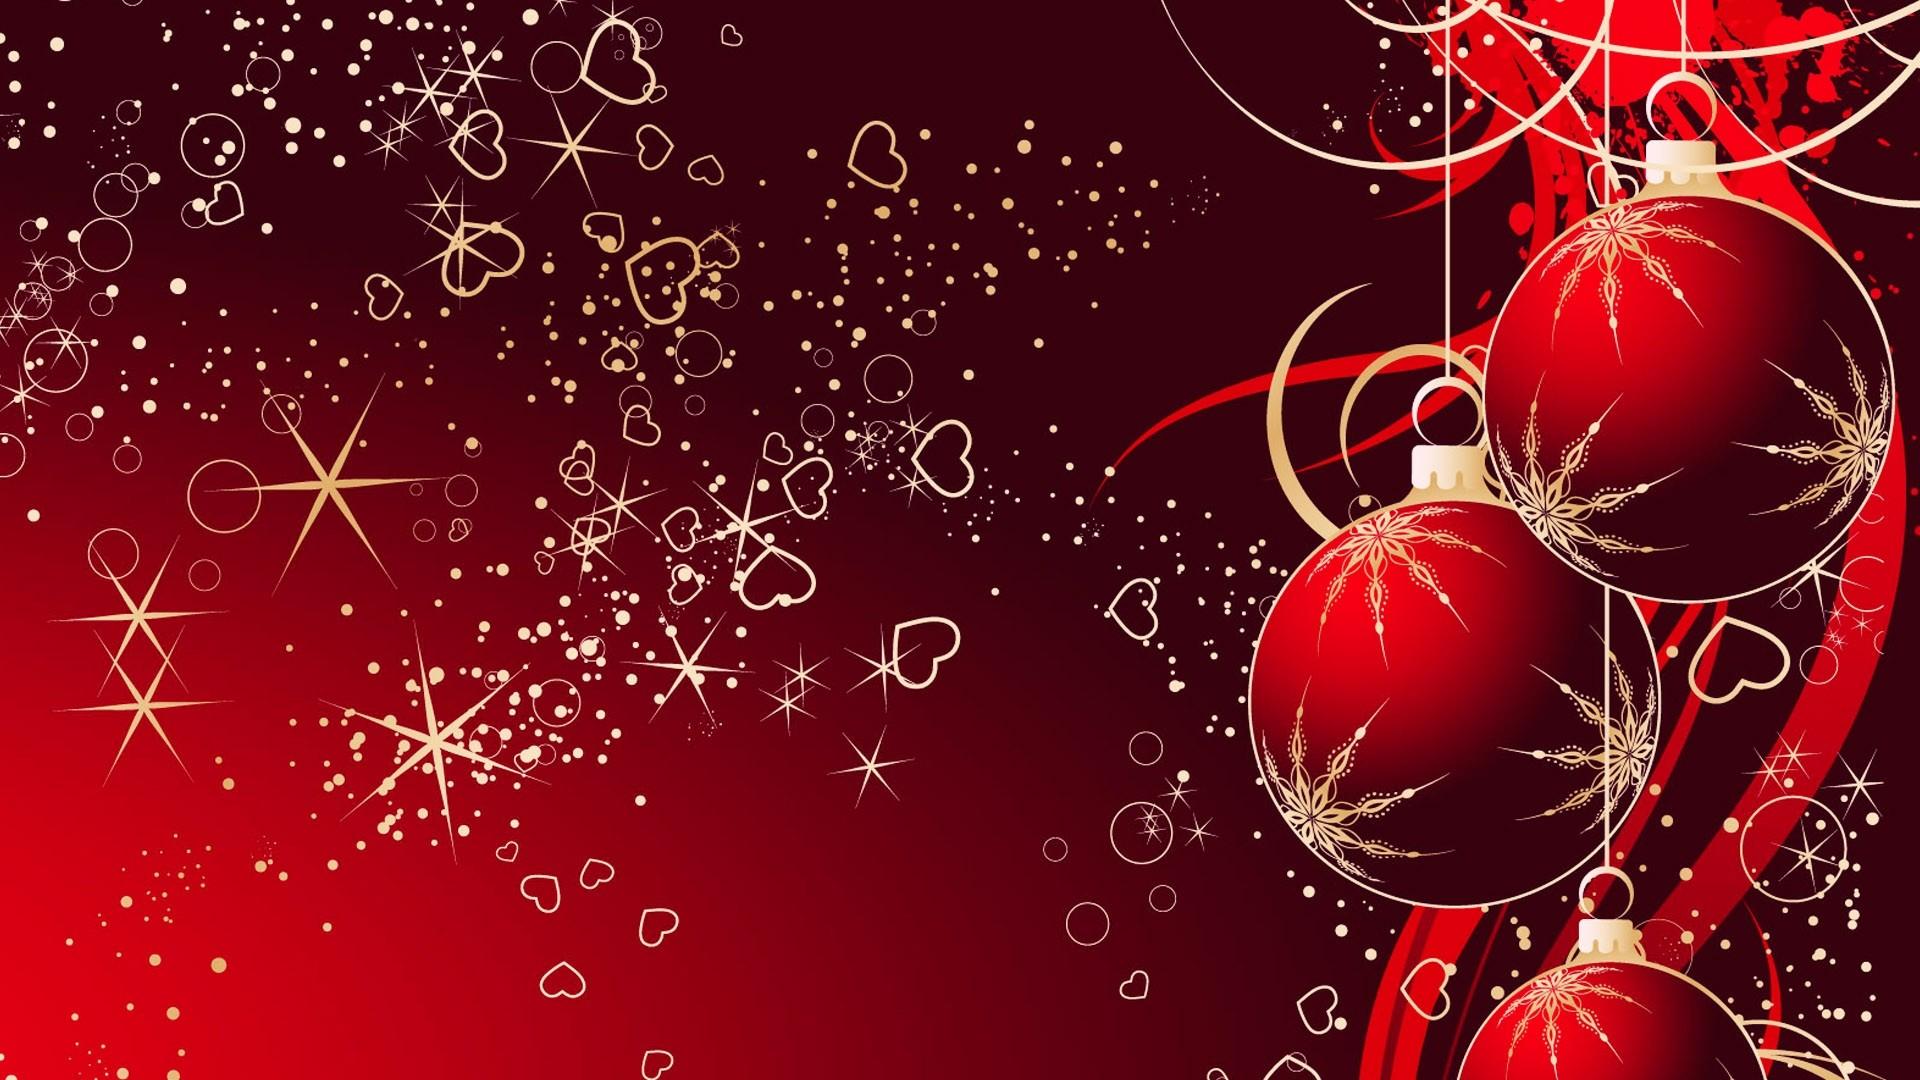 Jingle bell christmas wallpapers for 1080p.